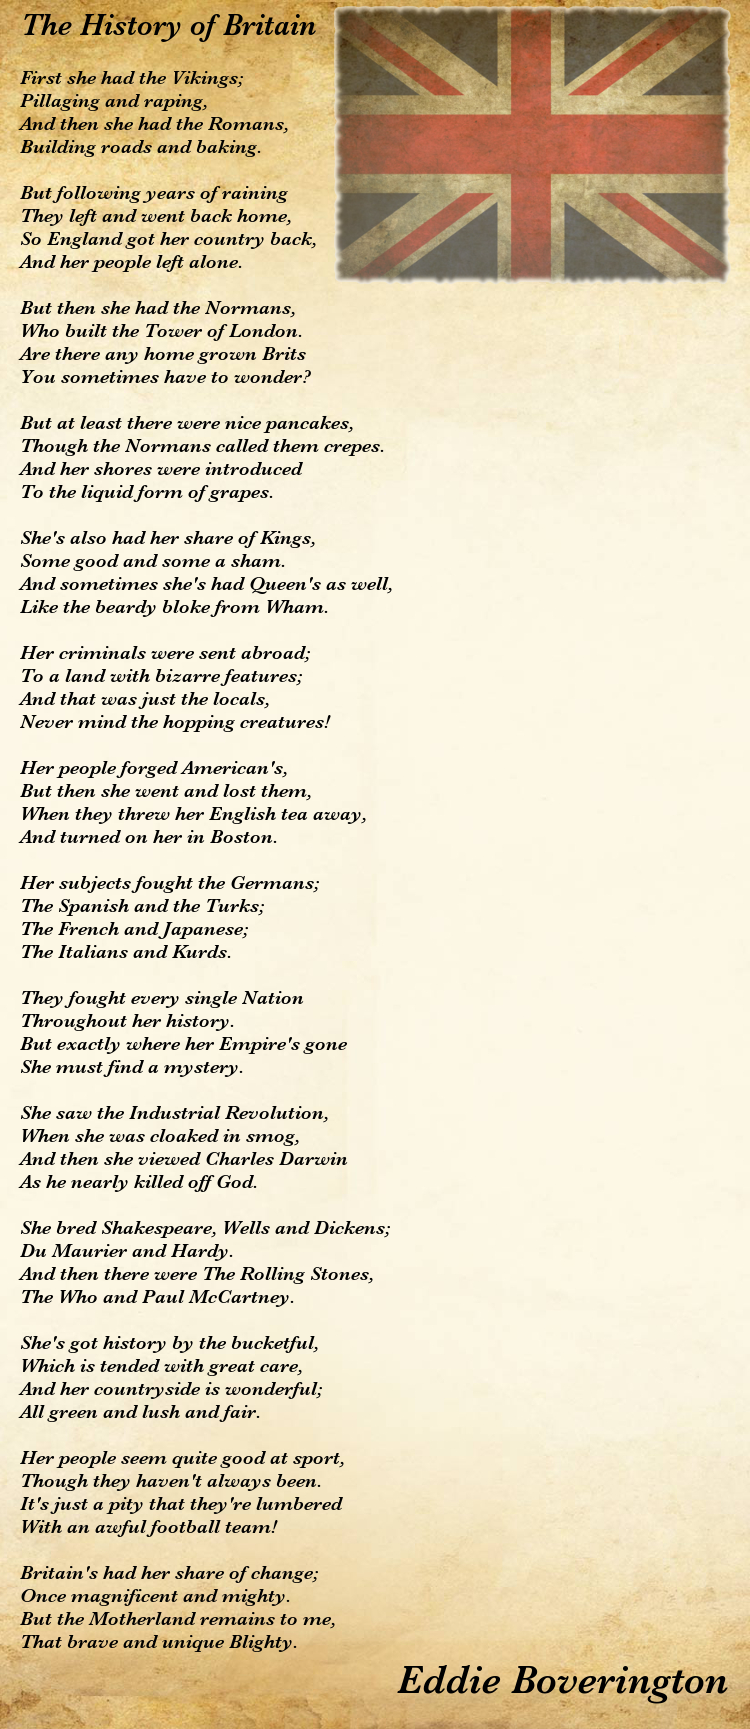 eddie-boverington-history-britain